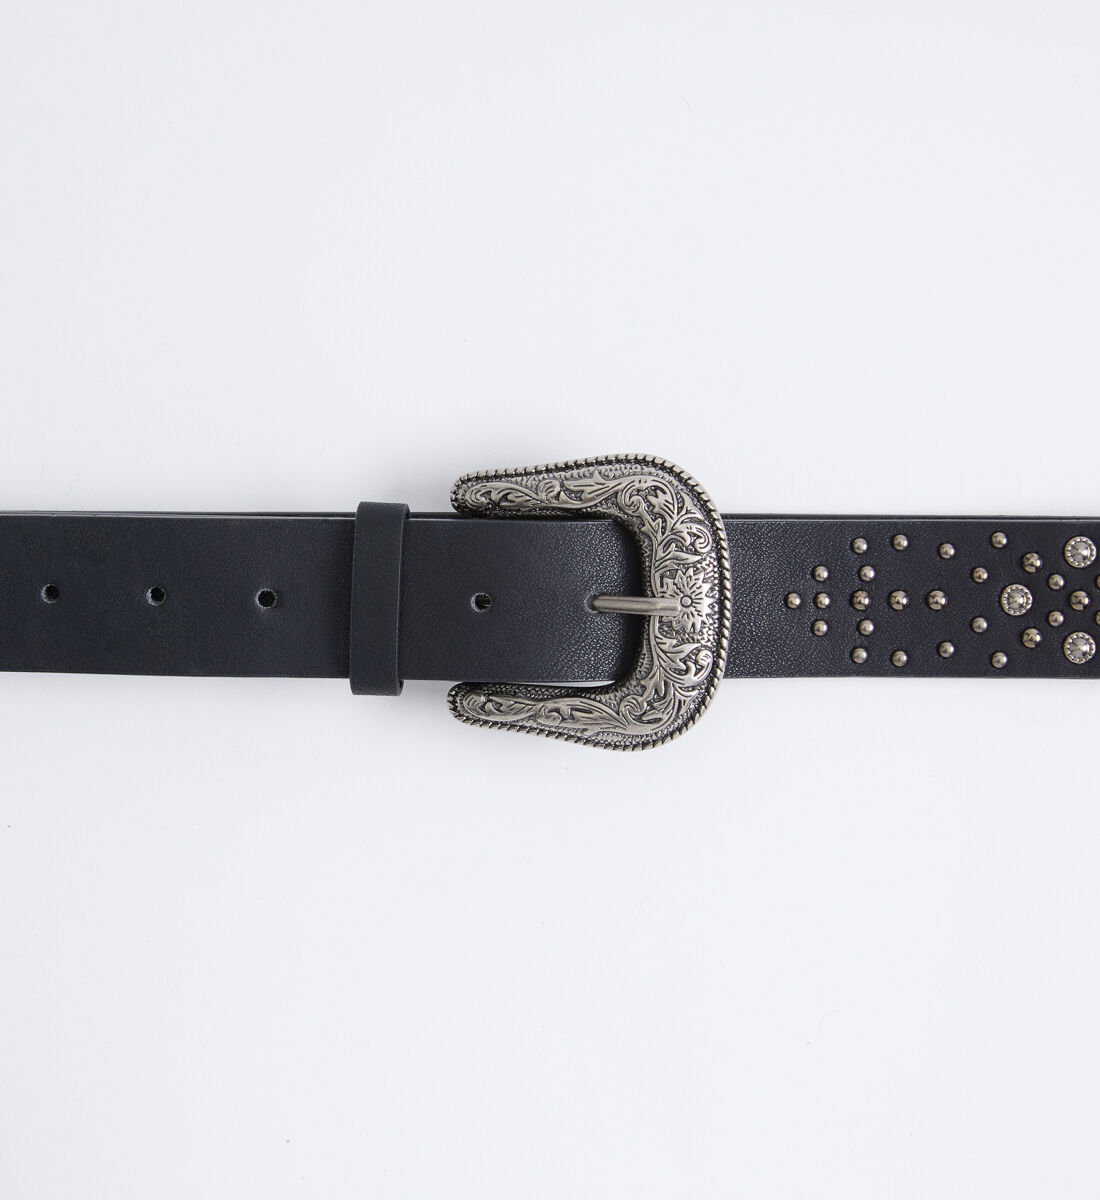 Western Studded Womens Belt Alt Image 1